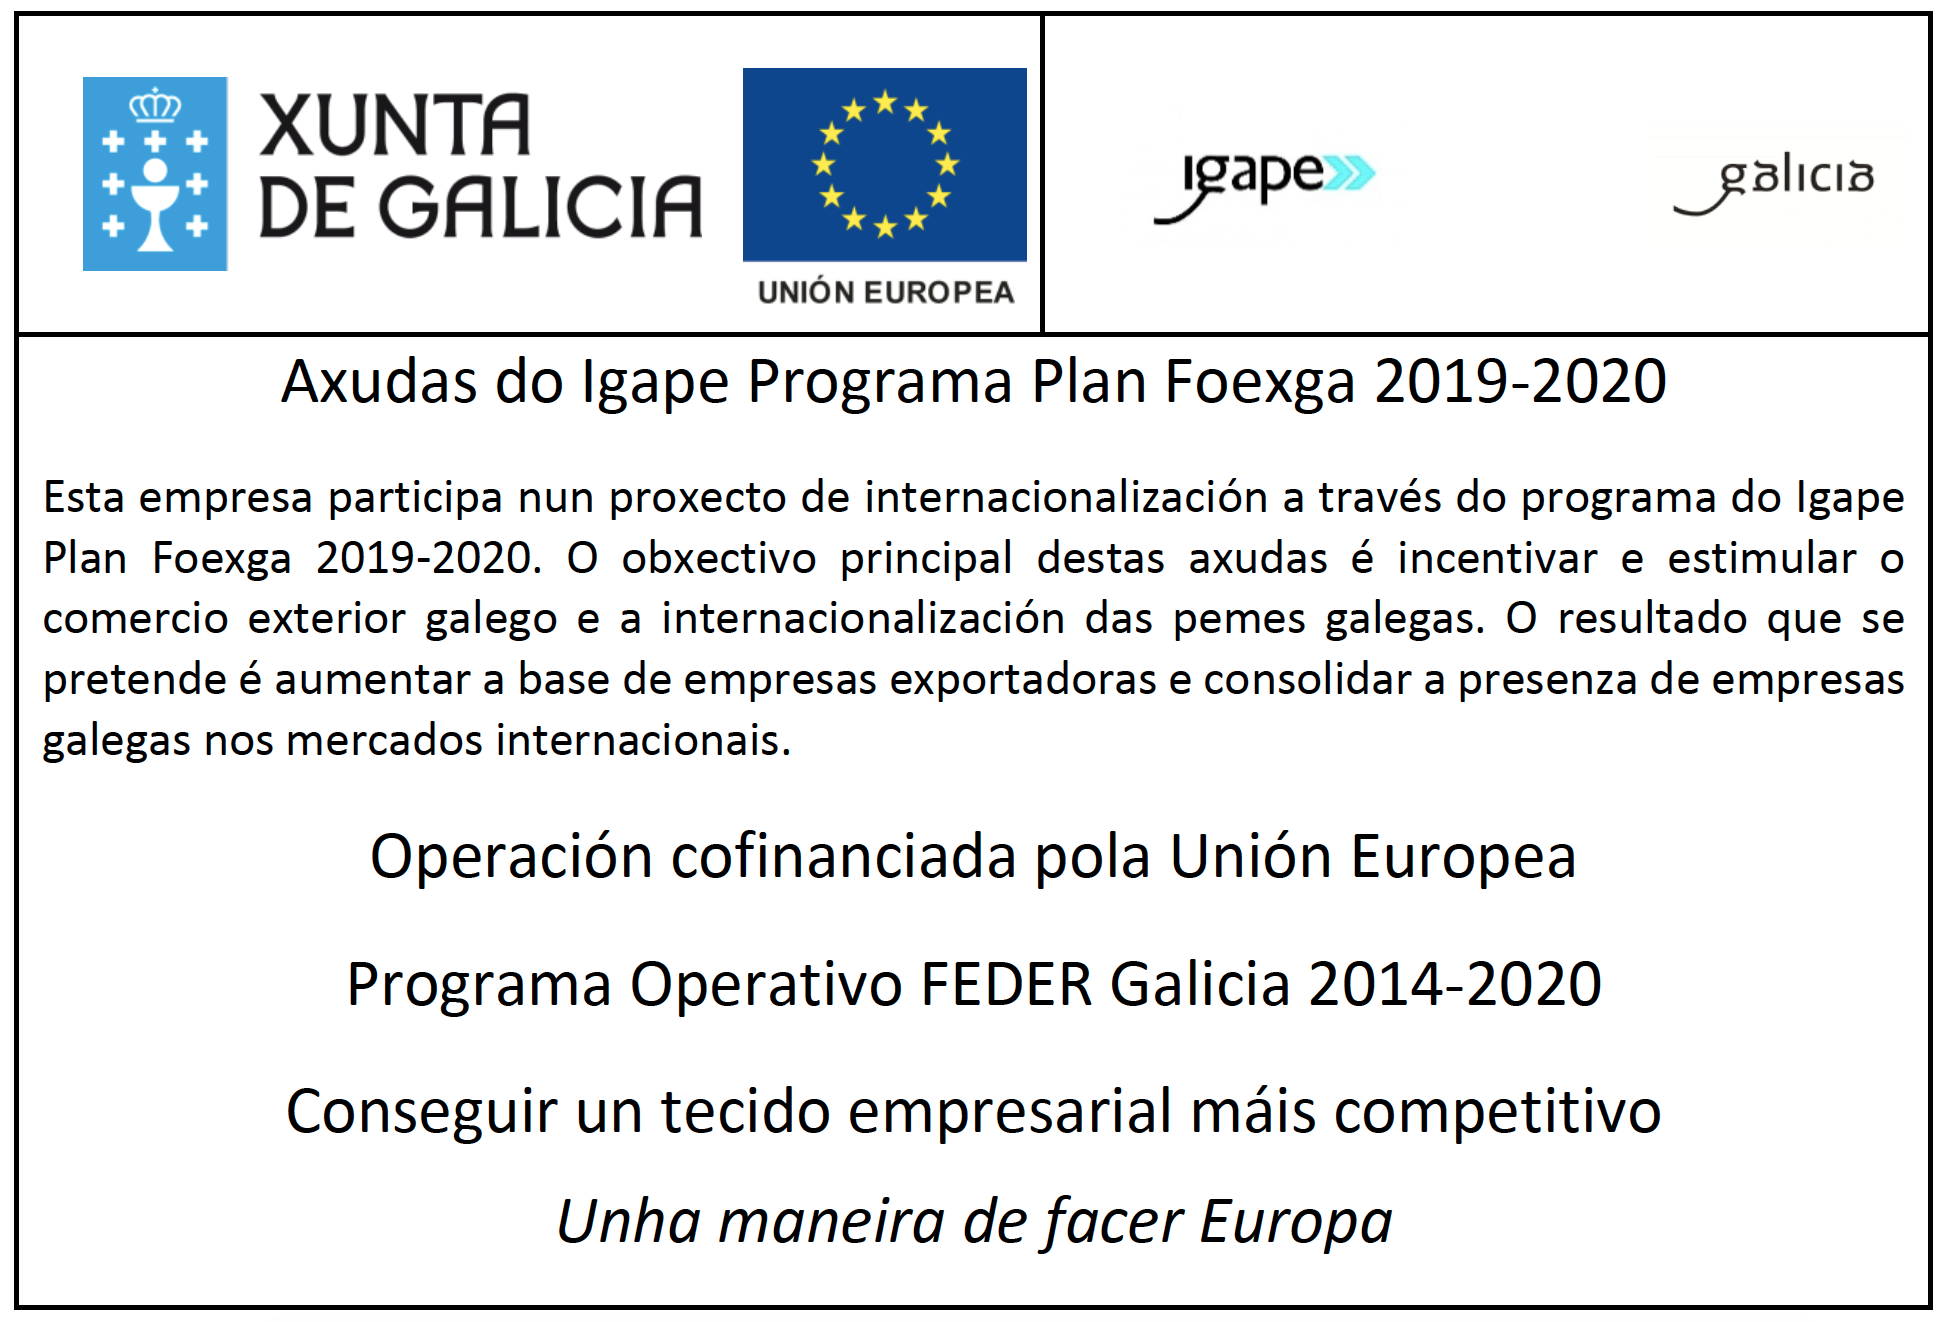 foexga-2019-2020